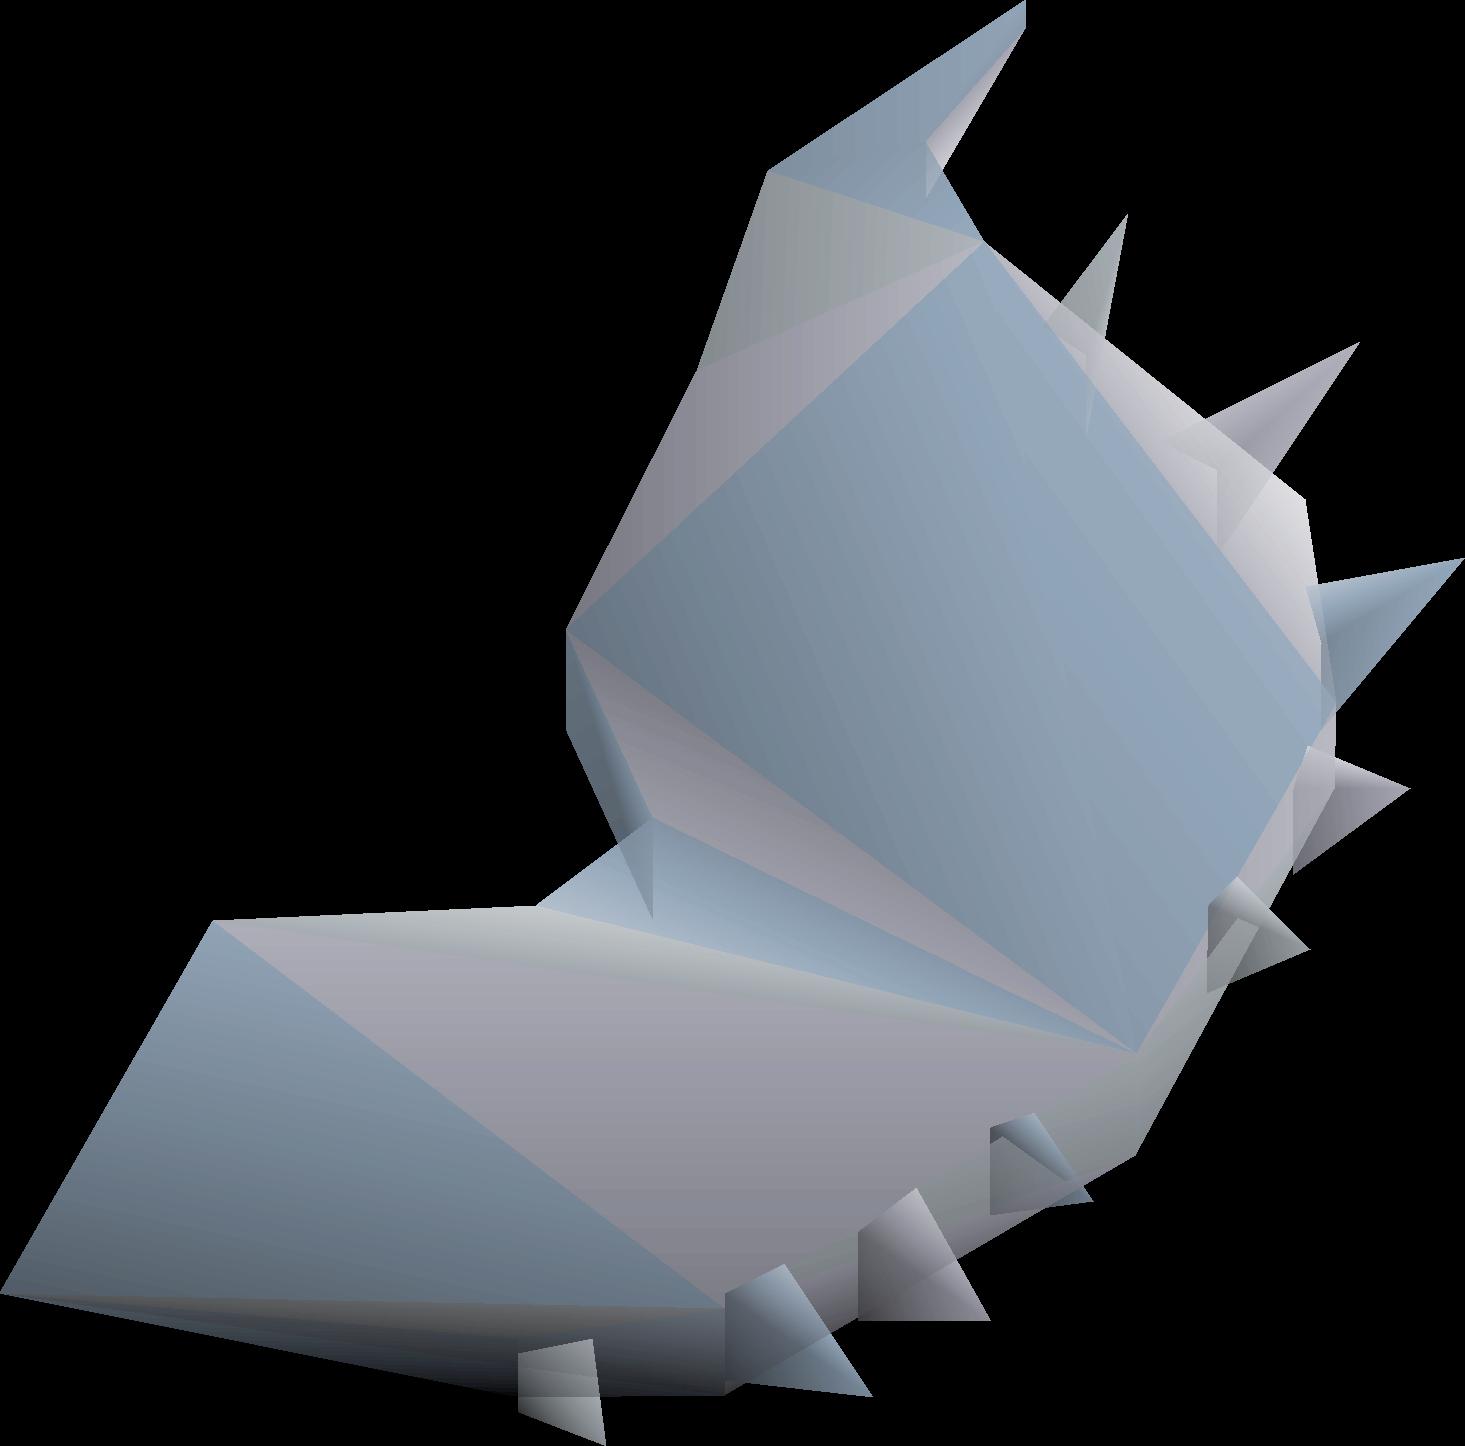 Crystal shield - OSRS Wiki